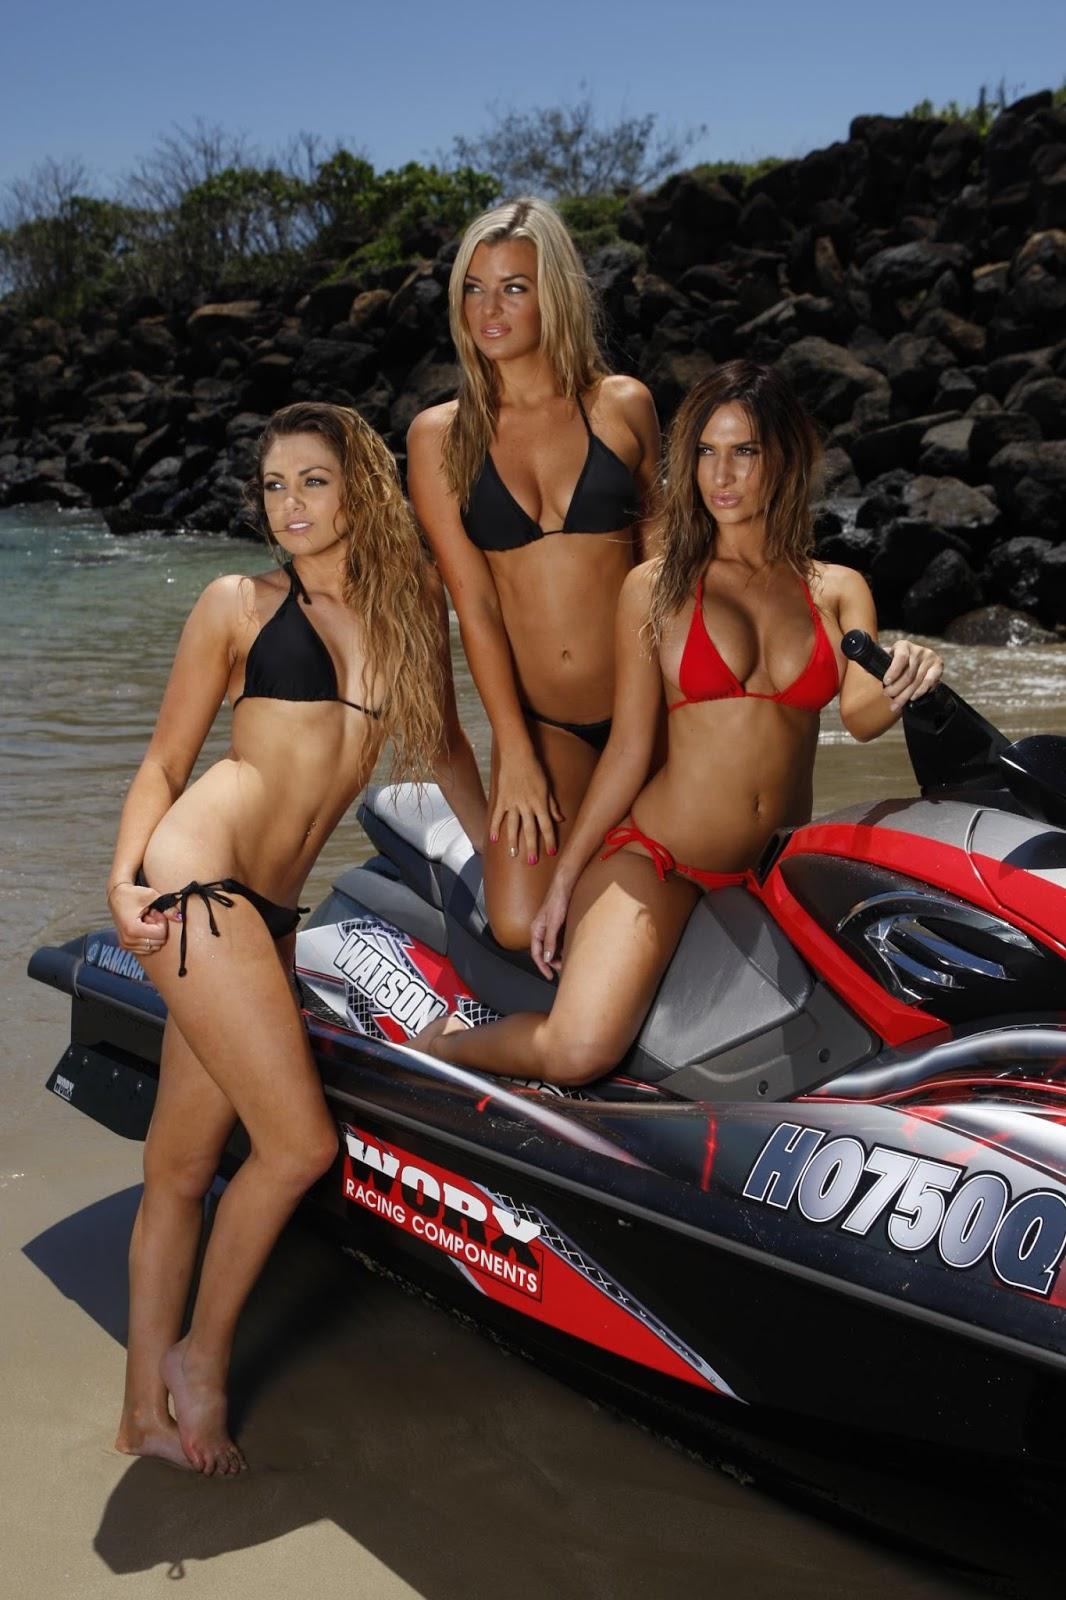 Mulher em Jet Ski, Gostosas de Jet Ski, Dupla de Gostosas de Jet SkiWoman on the PWC, the Sexy on the Jet Ski, babe om water bike,Sexy Motorcycle, two girls in jet ski